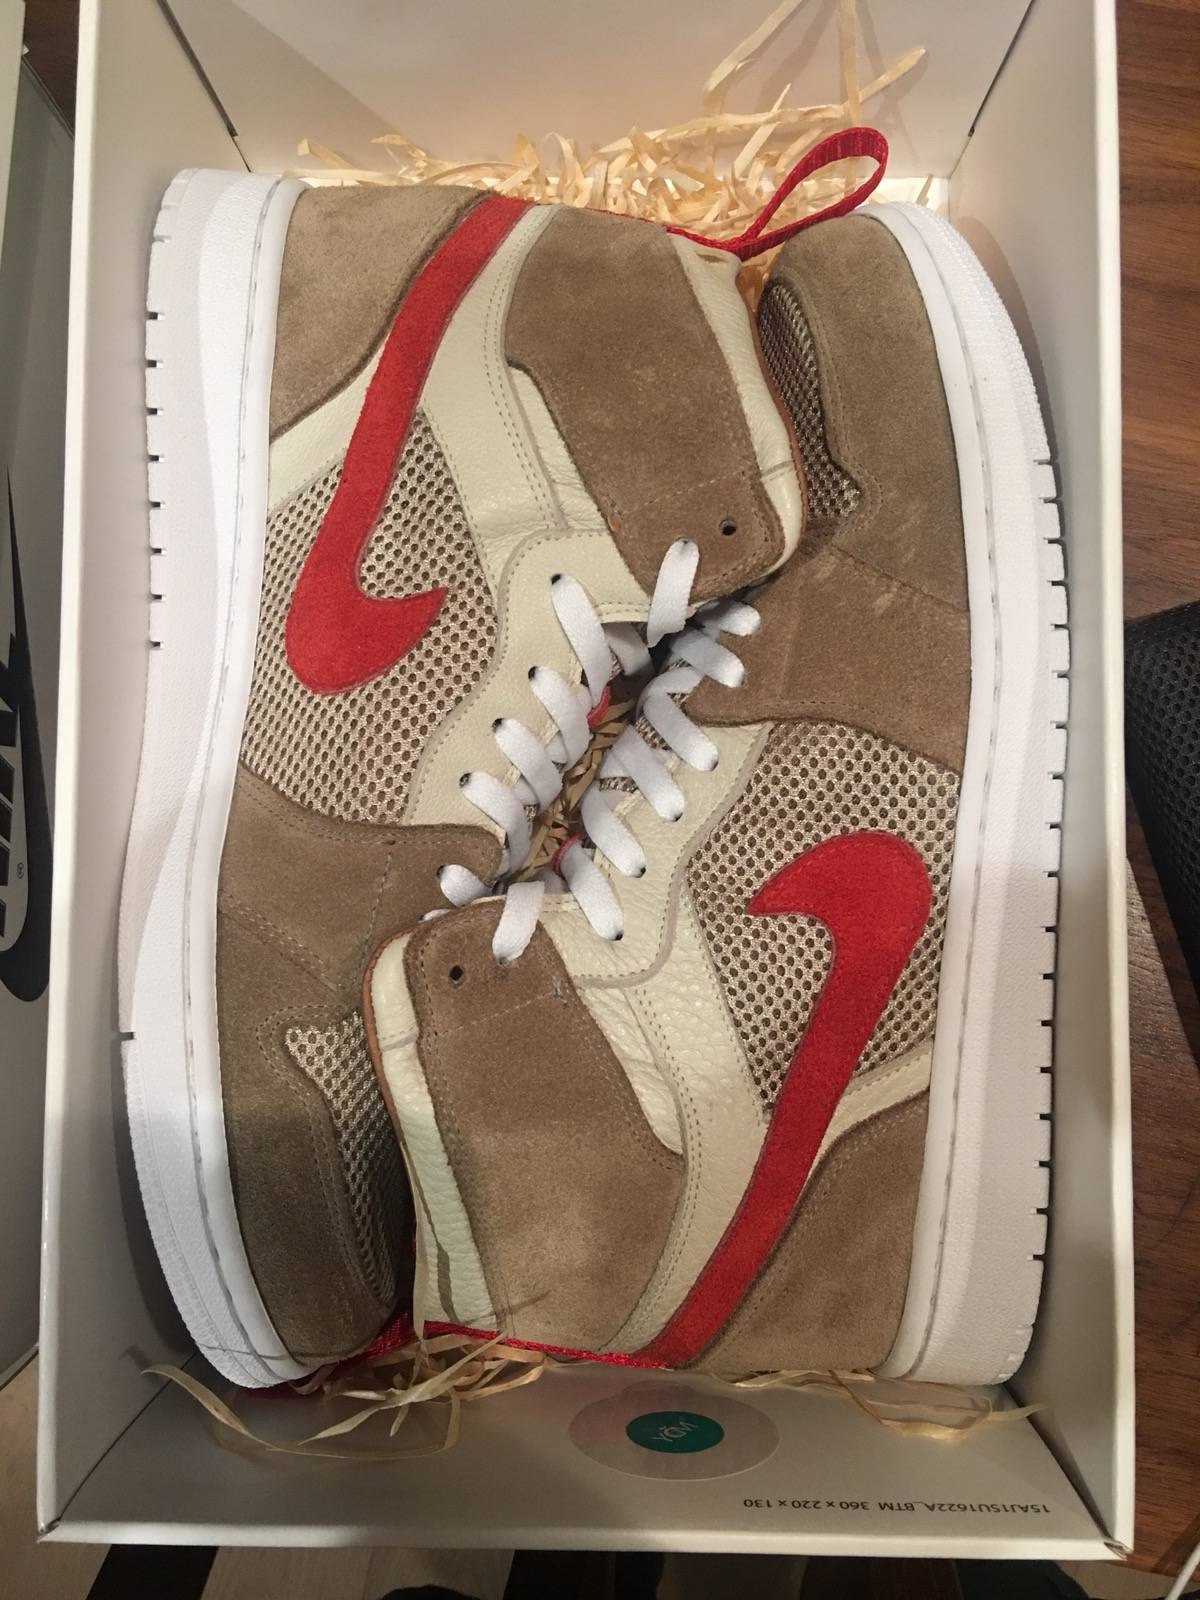 transmisión represa Año  Jordan Brand Tom Sachs Nike Air Jordan 1 Custom By Chase Shiel | Grailed